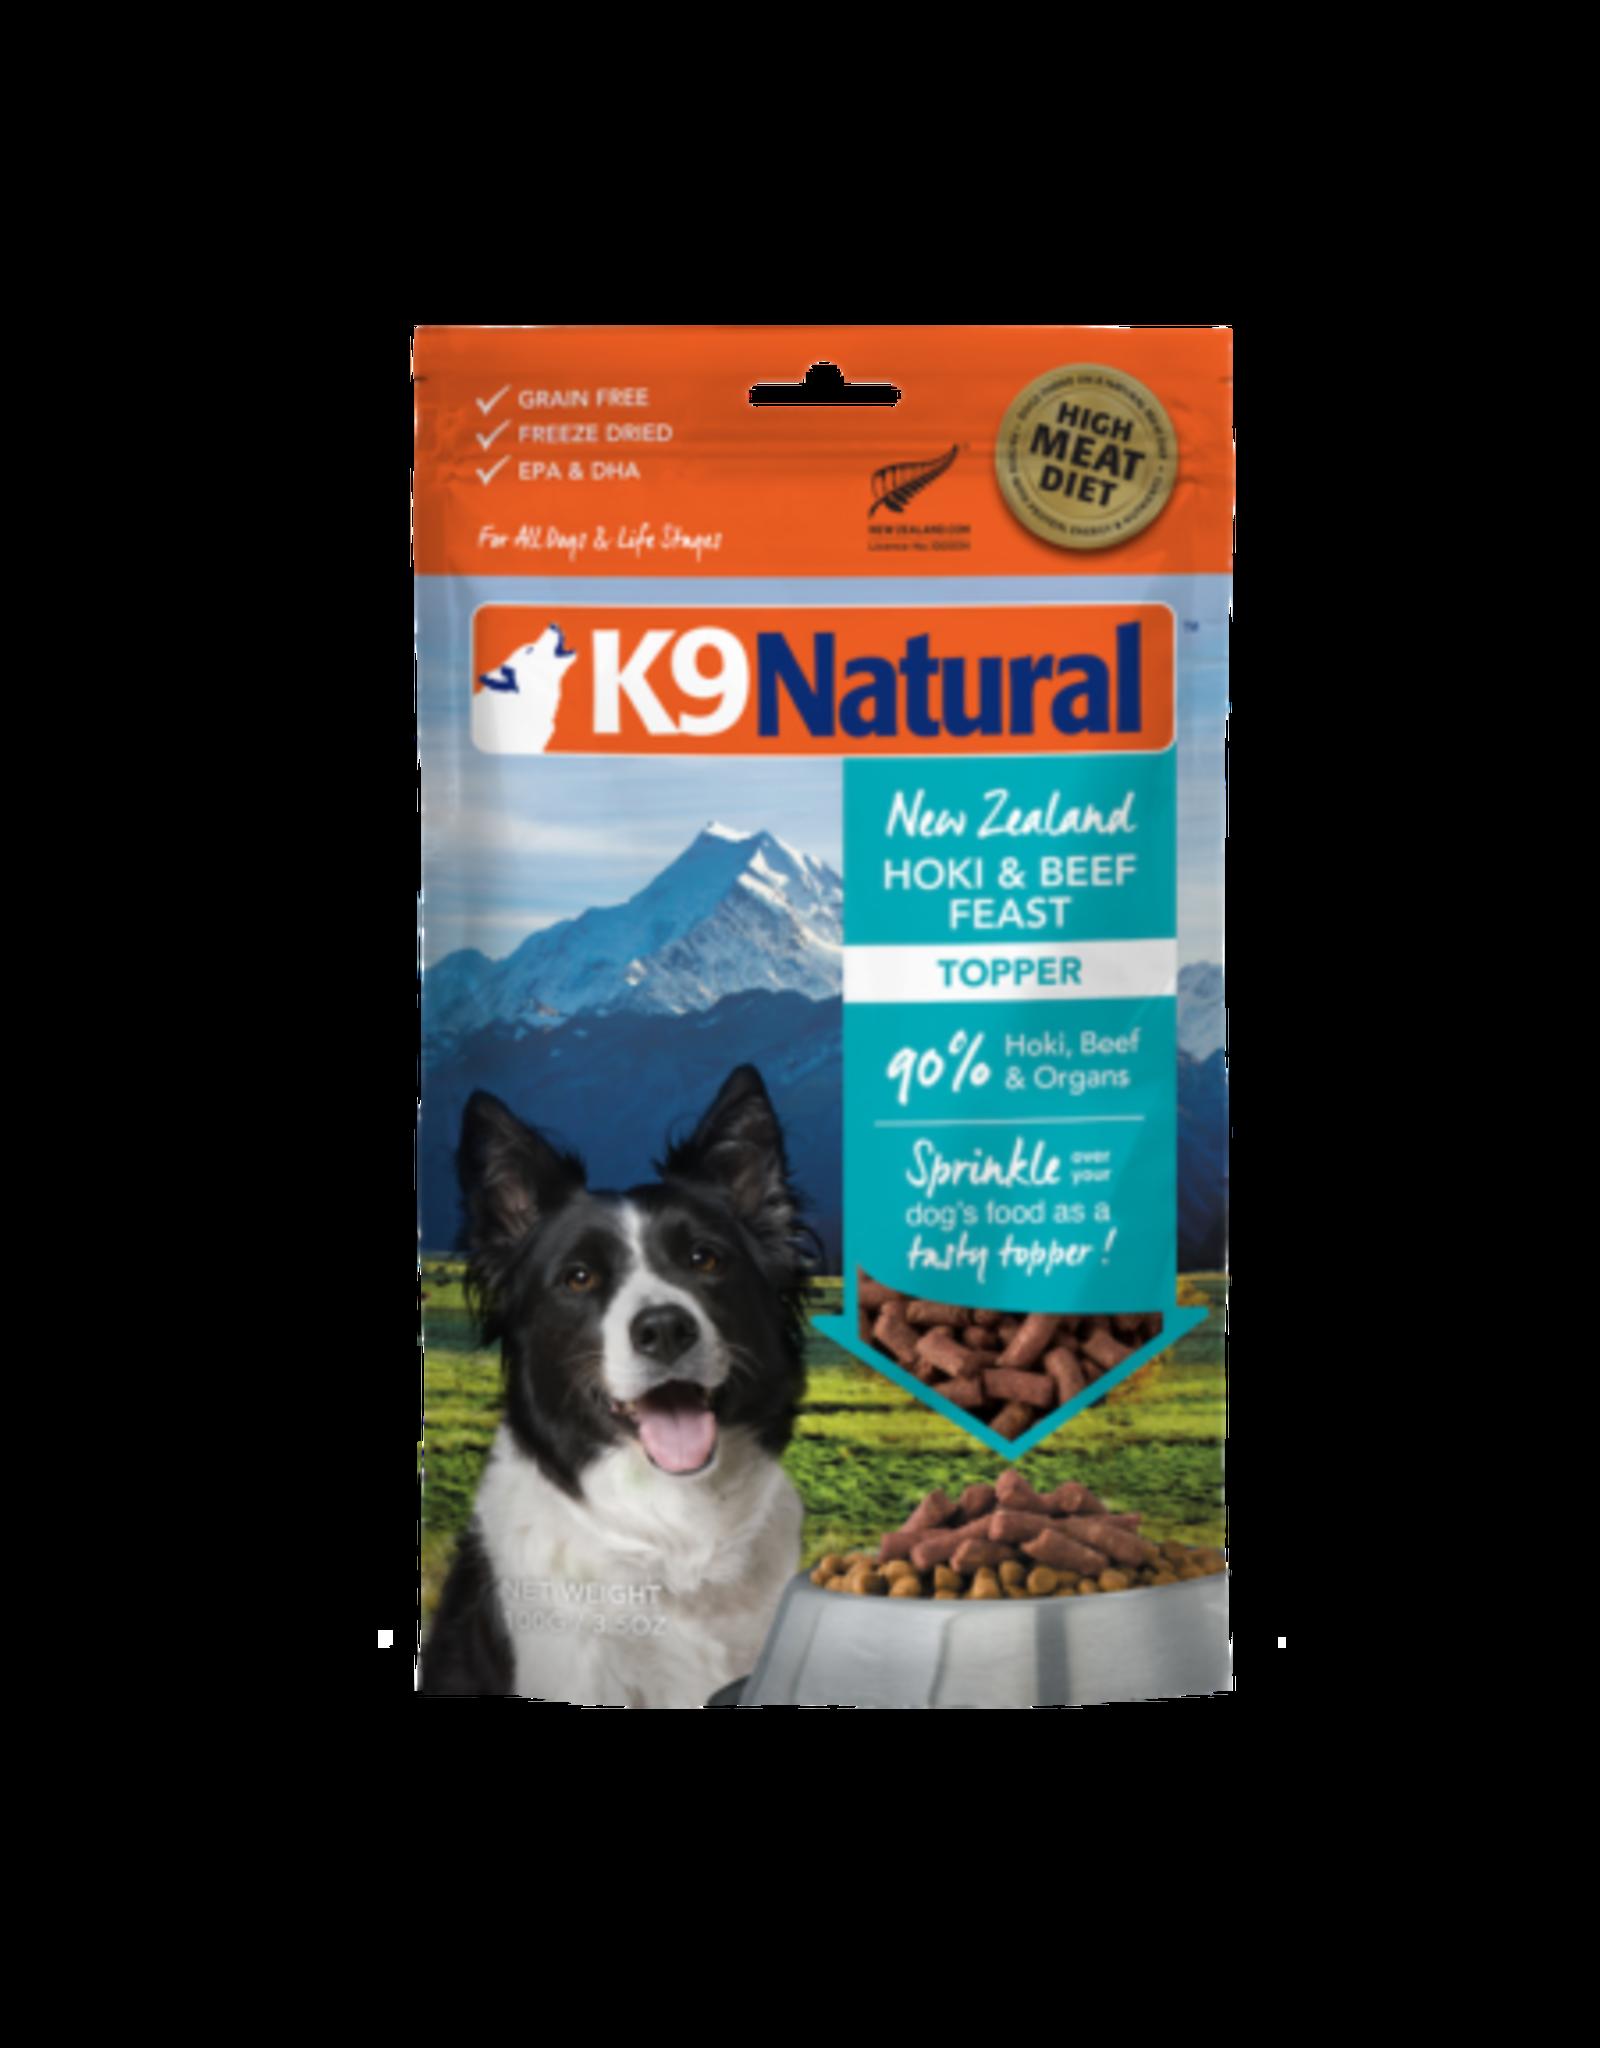 K9 Natural K9 Natural Freeze Dried Hoki & Beef  Feast Topper 3.5oz